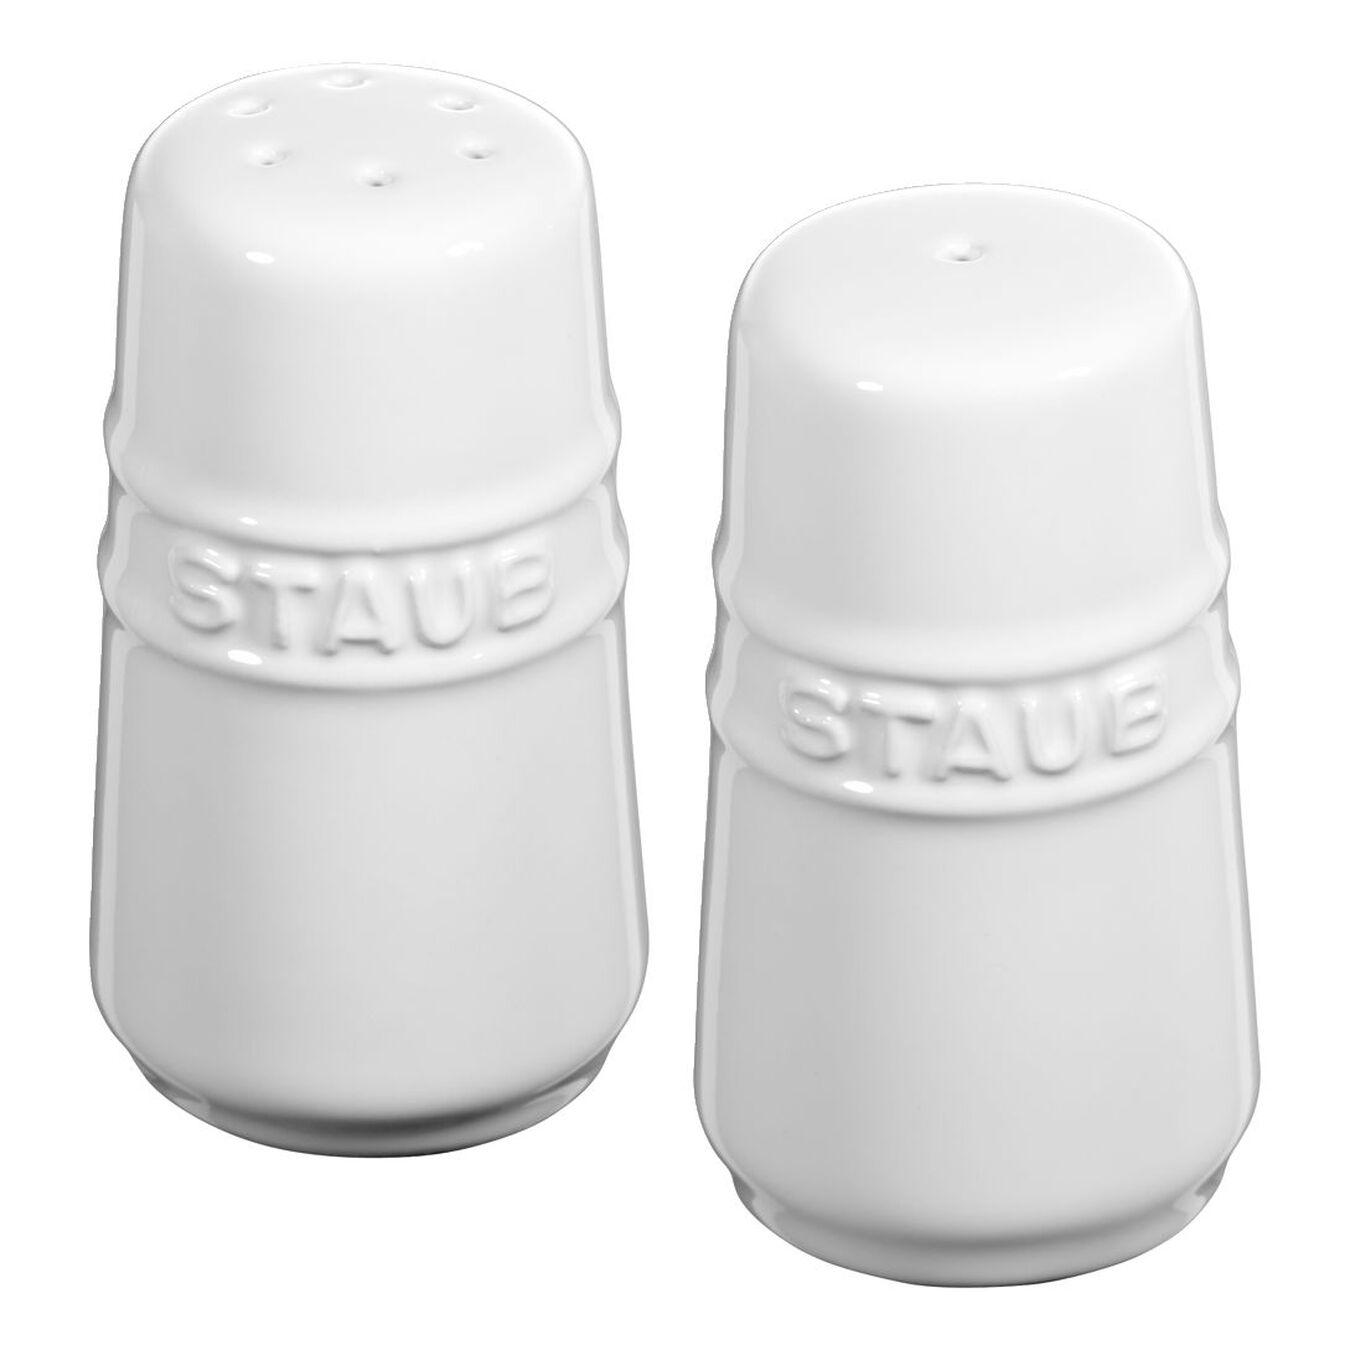 Salz & Pfefferstreuer 7 cm, Keramik, Reinweiß,,large 1